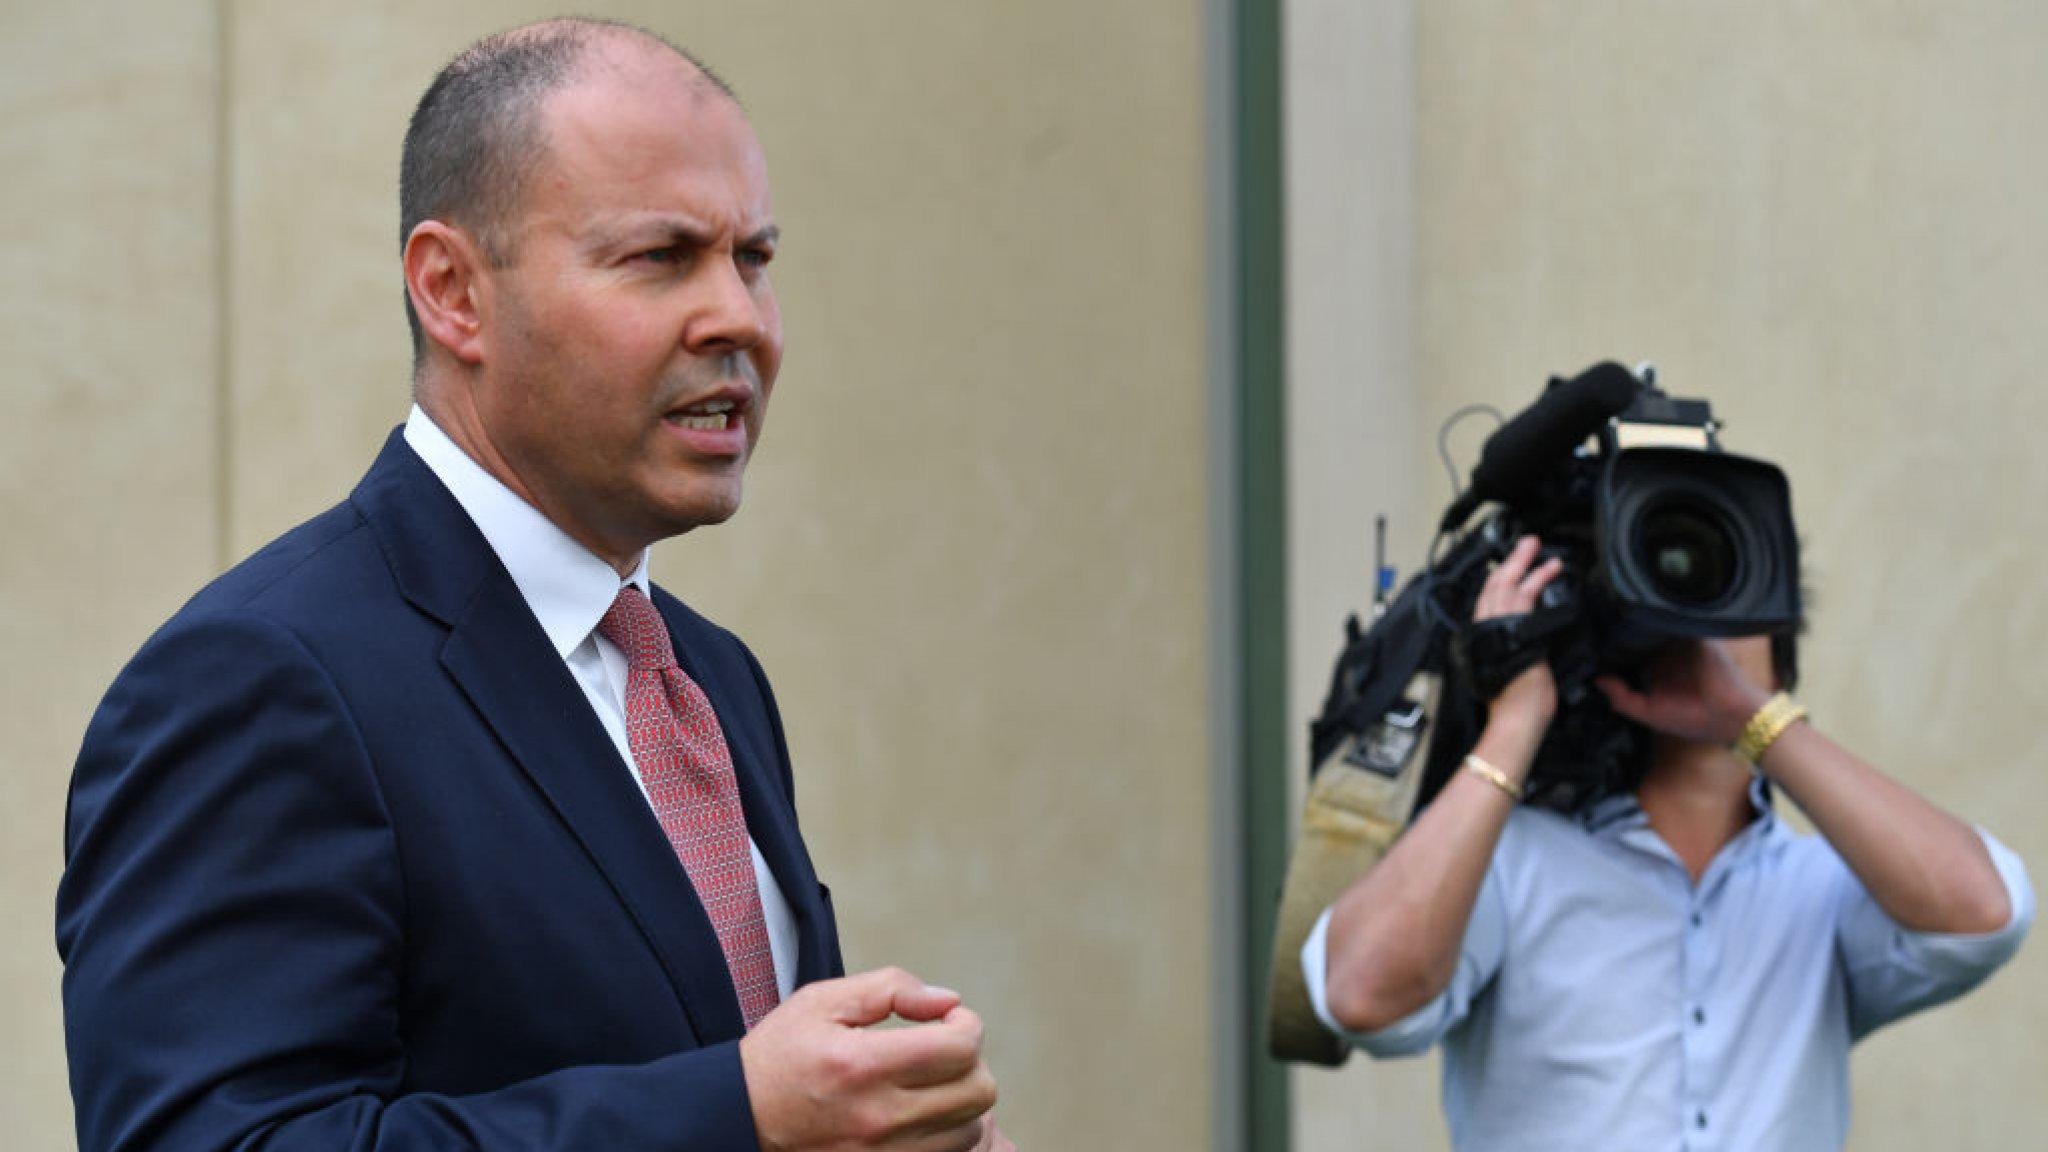 Buitenland Parlement Australië keurt baanbrekende mediawet goed - RTL Nieuws